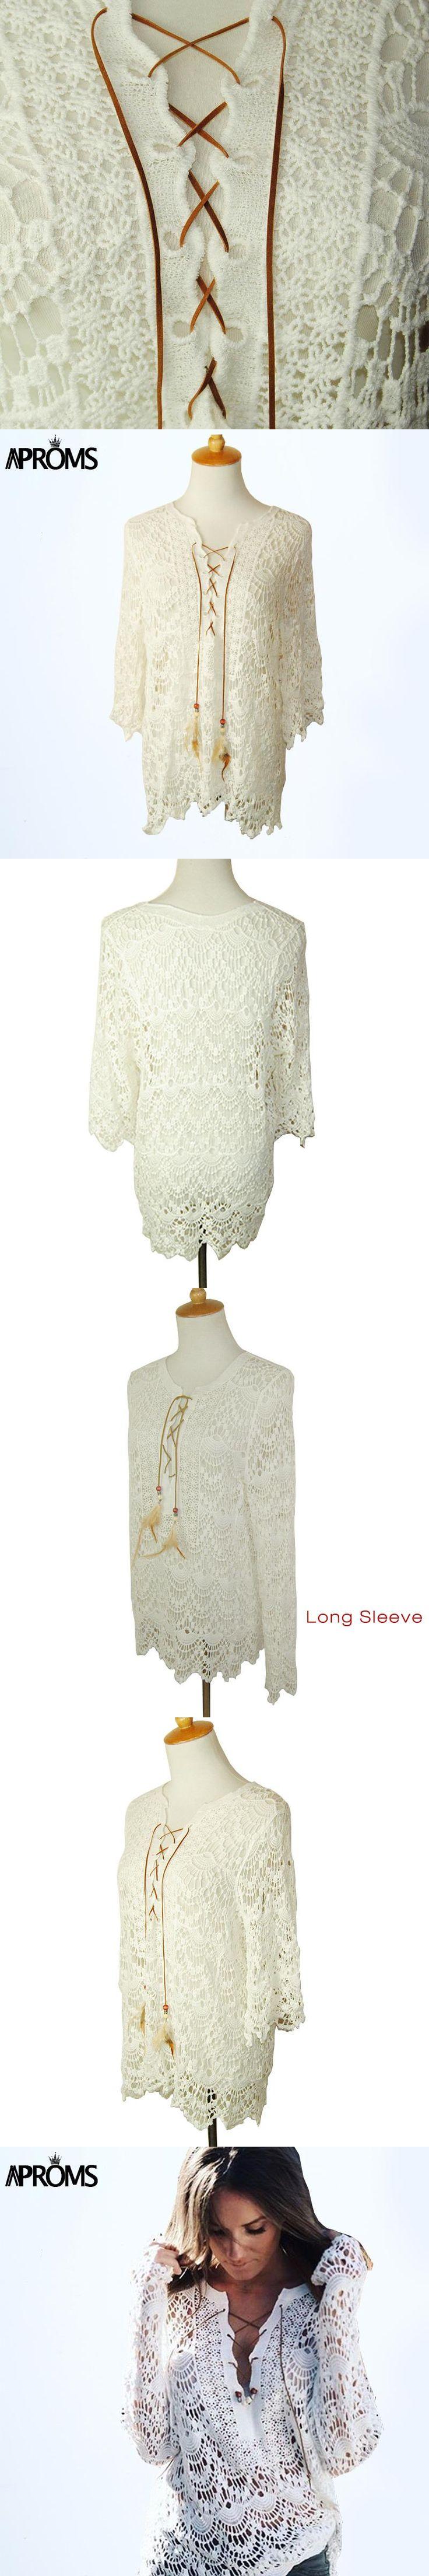 Autumn Elegant White Lace Blouse Tunic Shirt Women Tops 3/4 Sleeve Vintage Girls Blouse 2017 Sexy V Neck Renda Blusa 40445